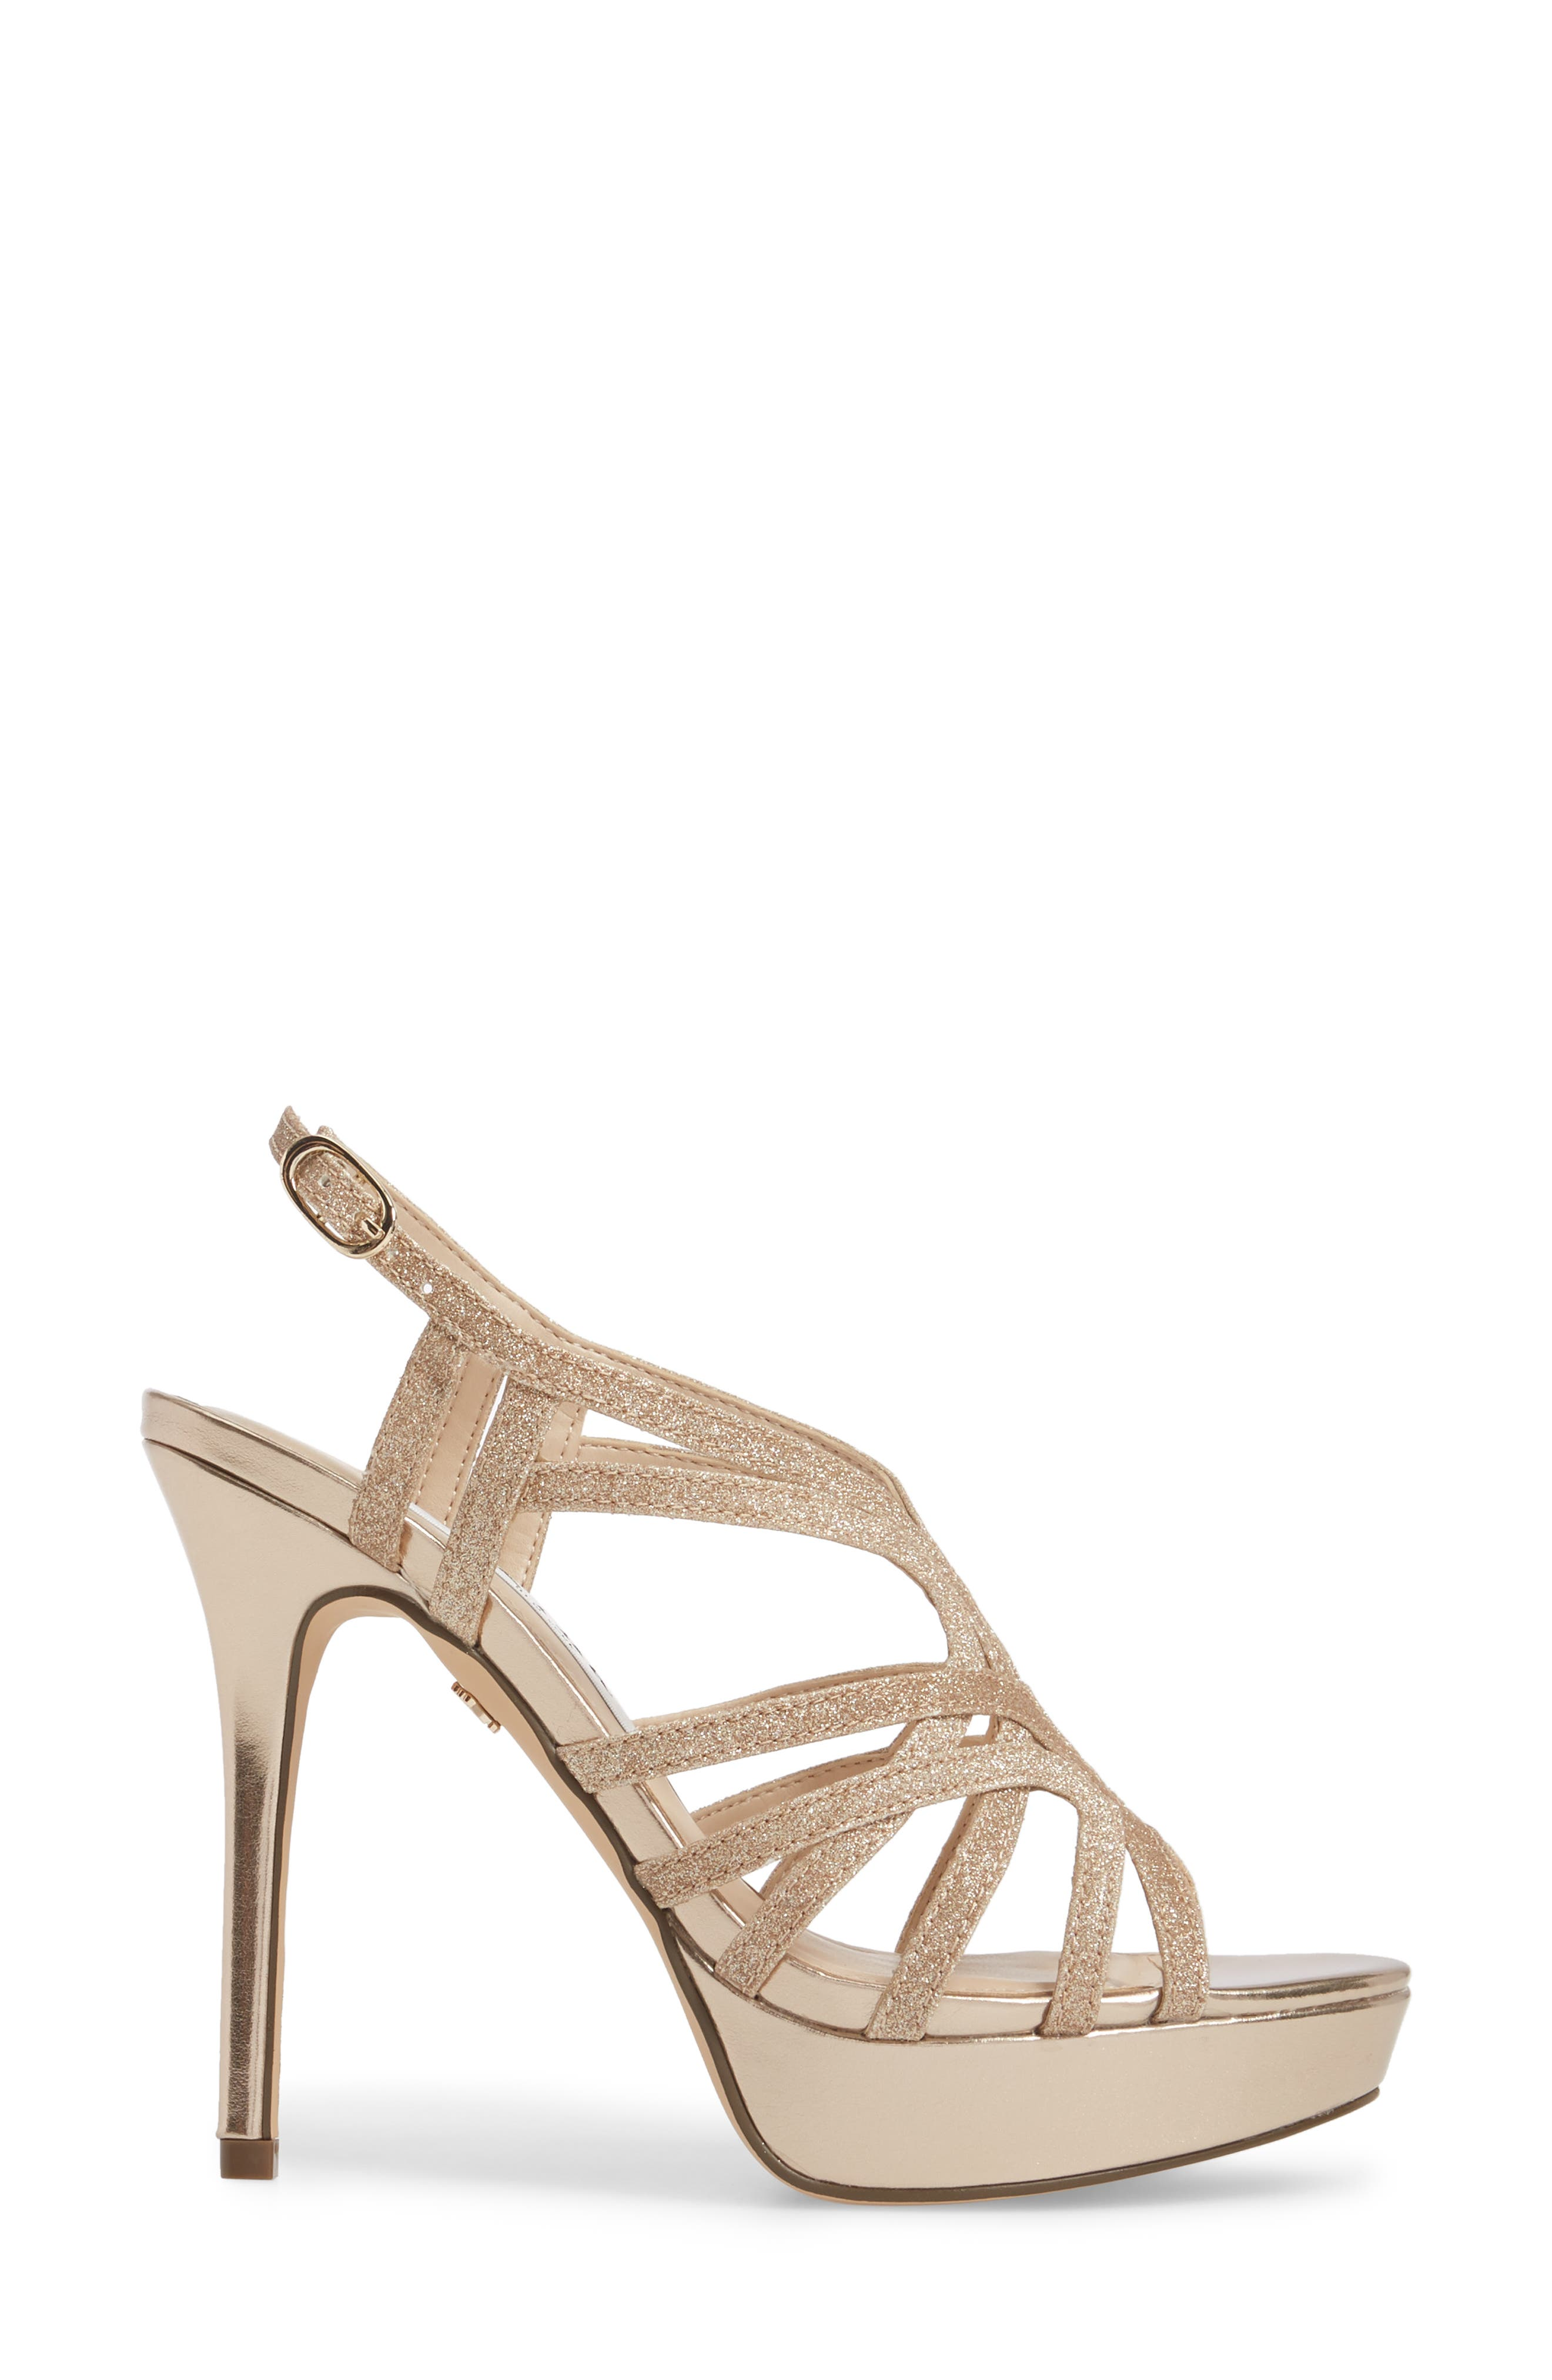 Solina Platform Sandal,                             Alternate thumbnail 3, color,                             Gold Glitter Fabric